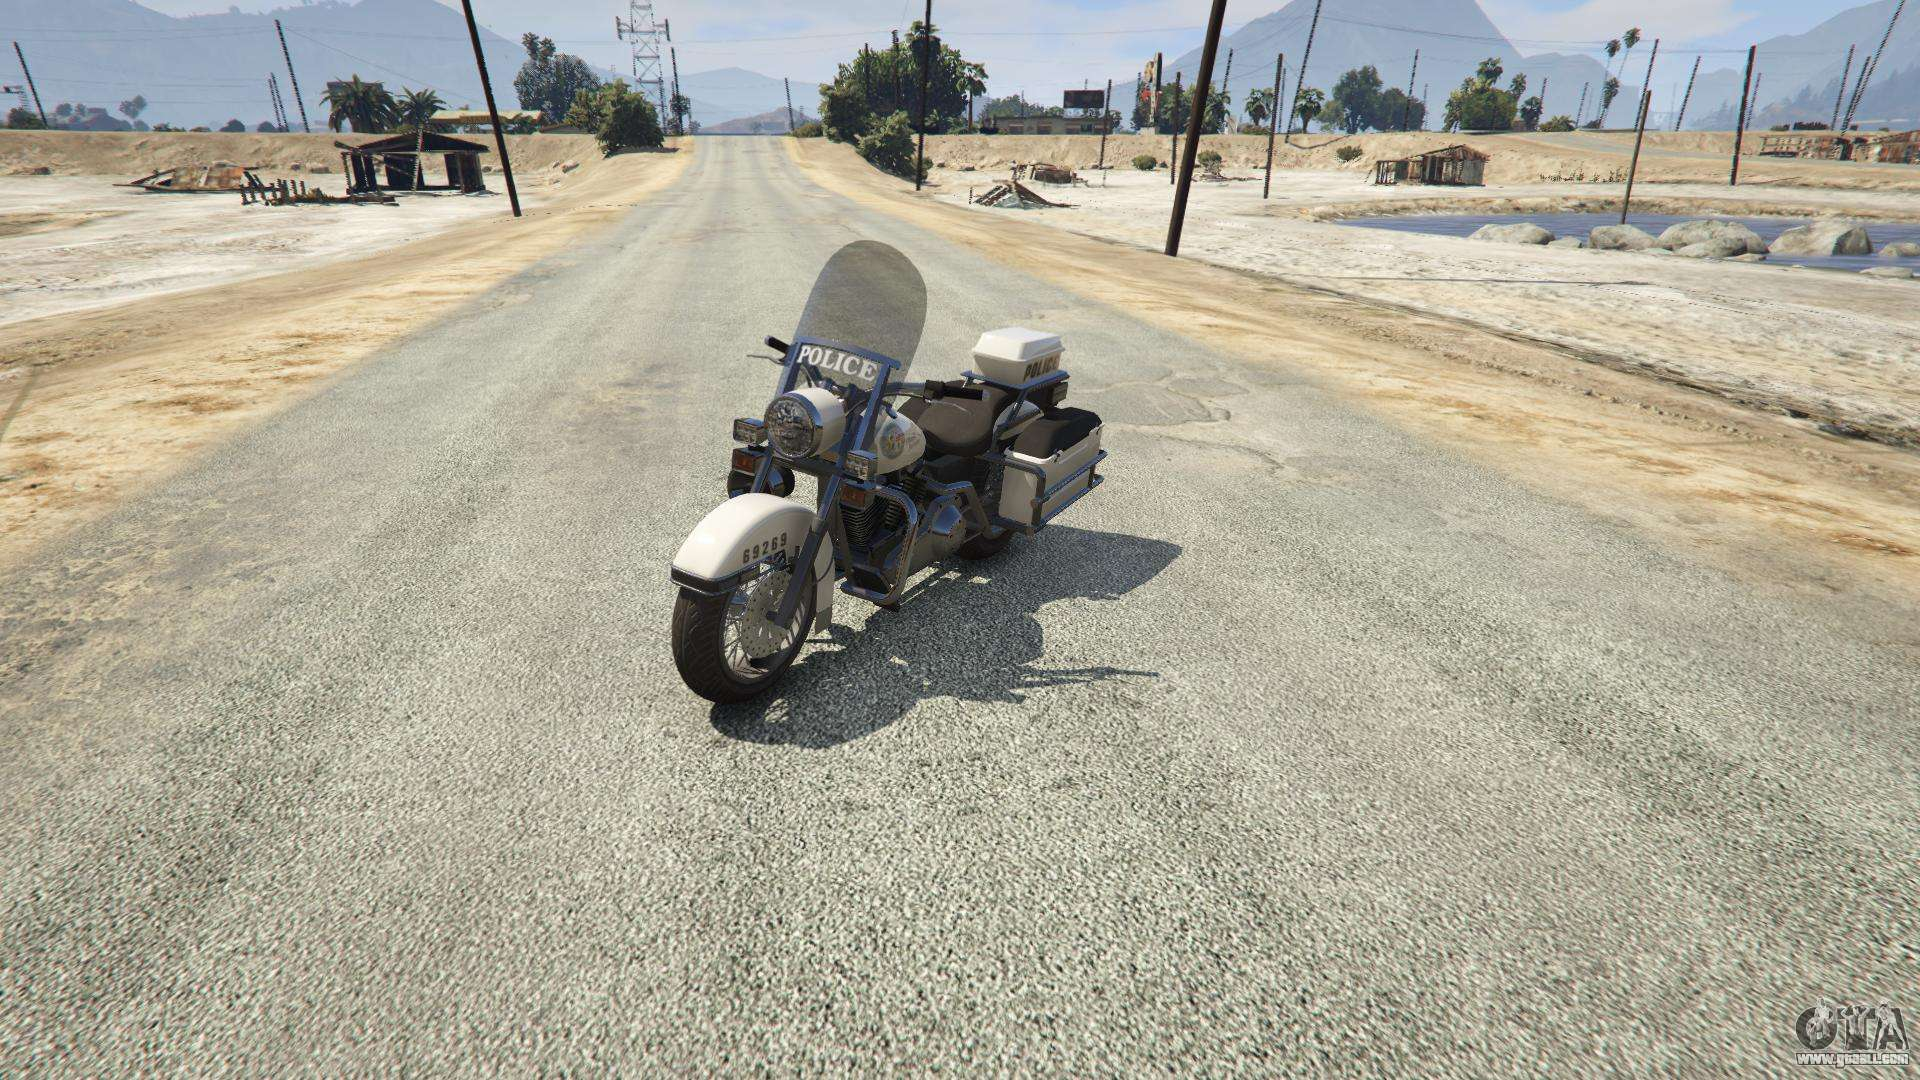 Police Bike GTA 5 - front view